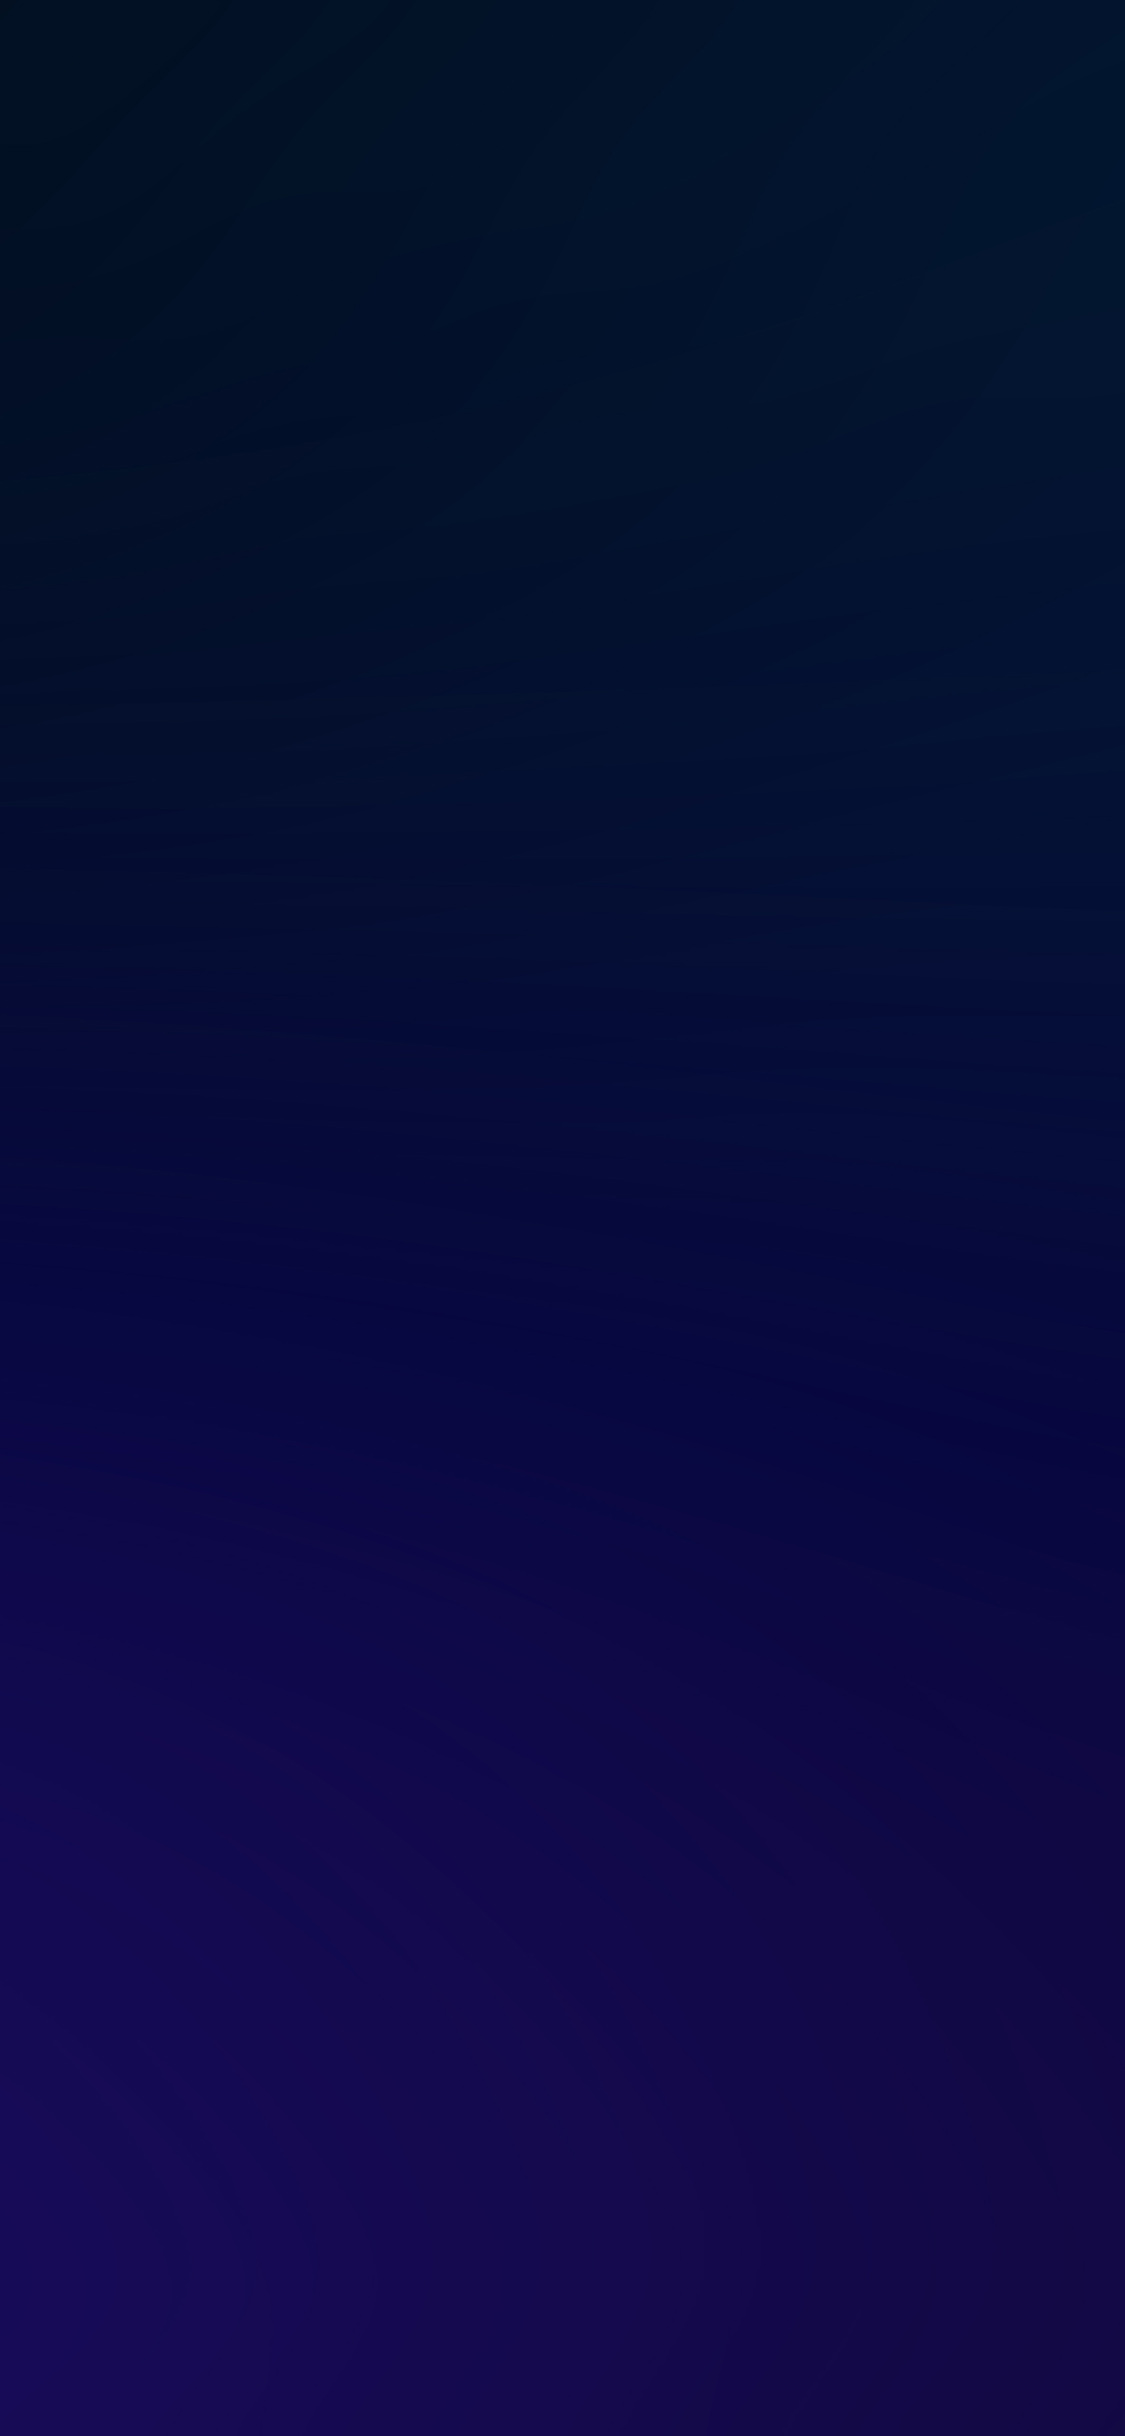 Sk62 Dark Blue Blur Gradation Wallpaper